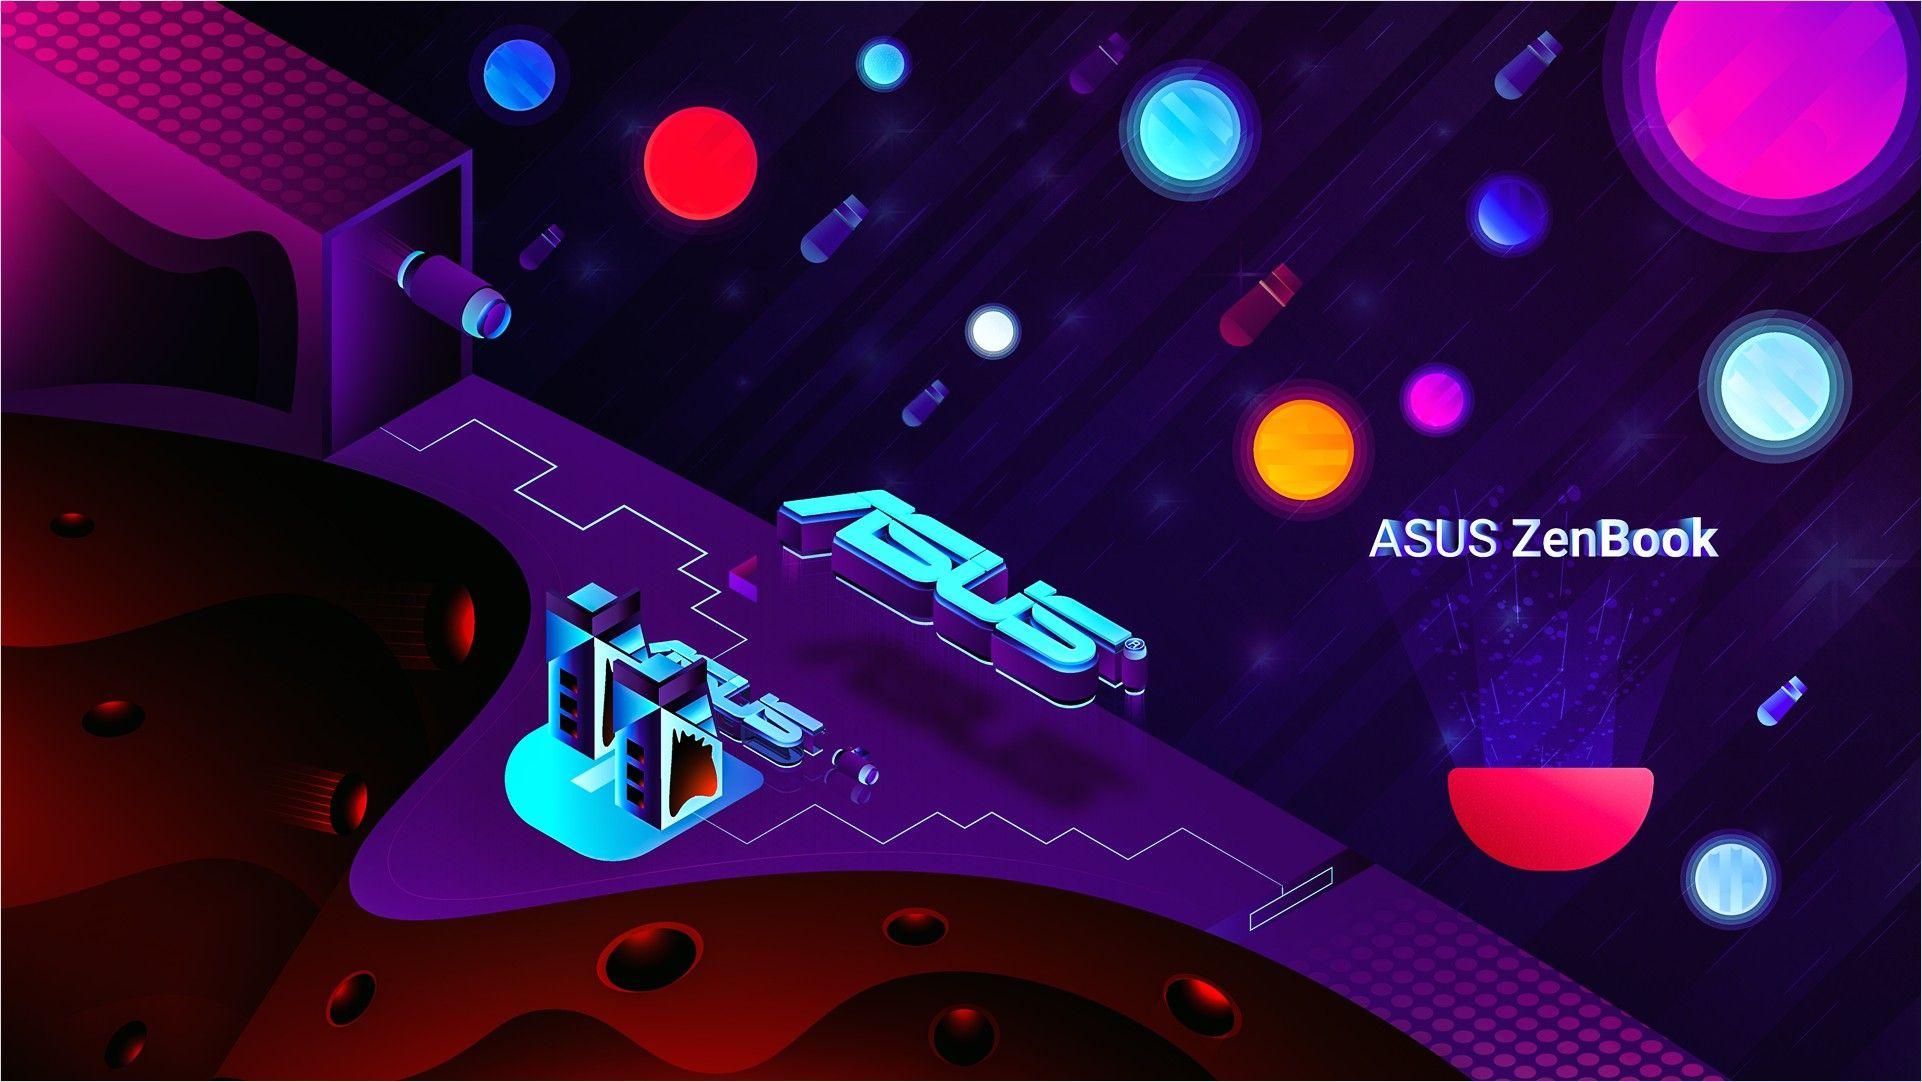 4k Resolution Asus Zenbook Wallpaper In 2020 Asus Wallpaper Graphic Design Illustration